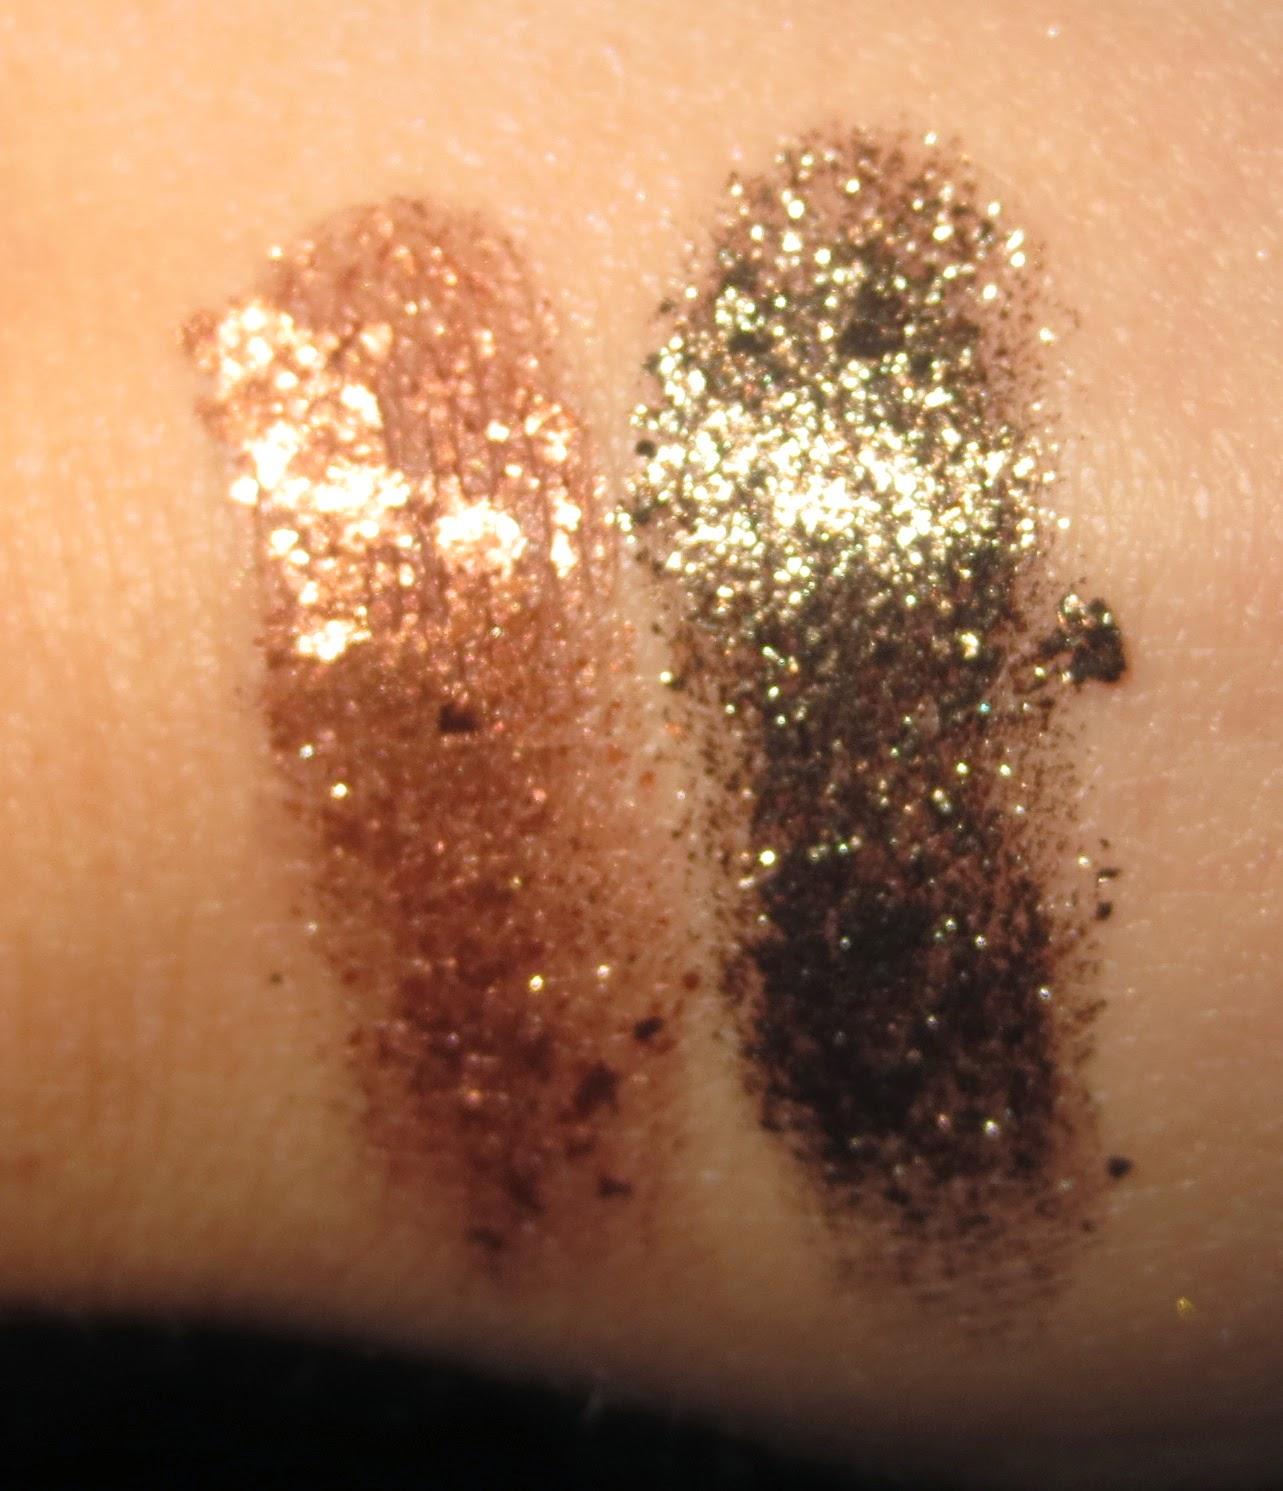 Stila Magnificent Metals Foil Finish Eye Shadow - Vintage Black Gold & Comex Copper swatches